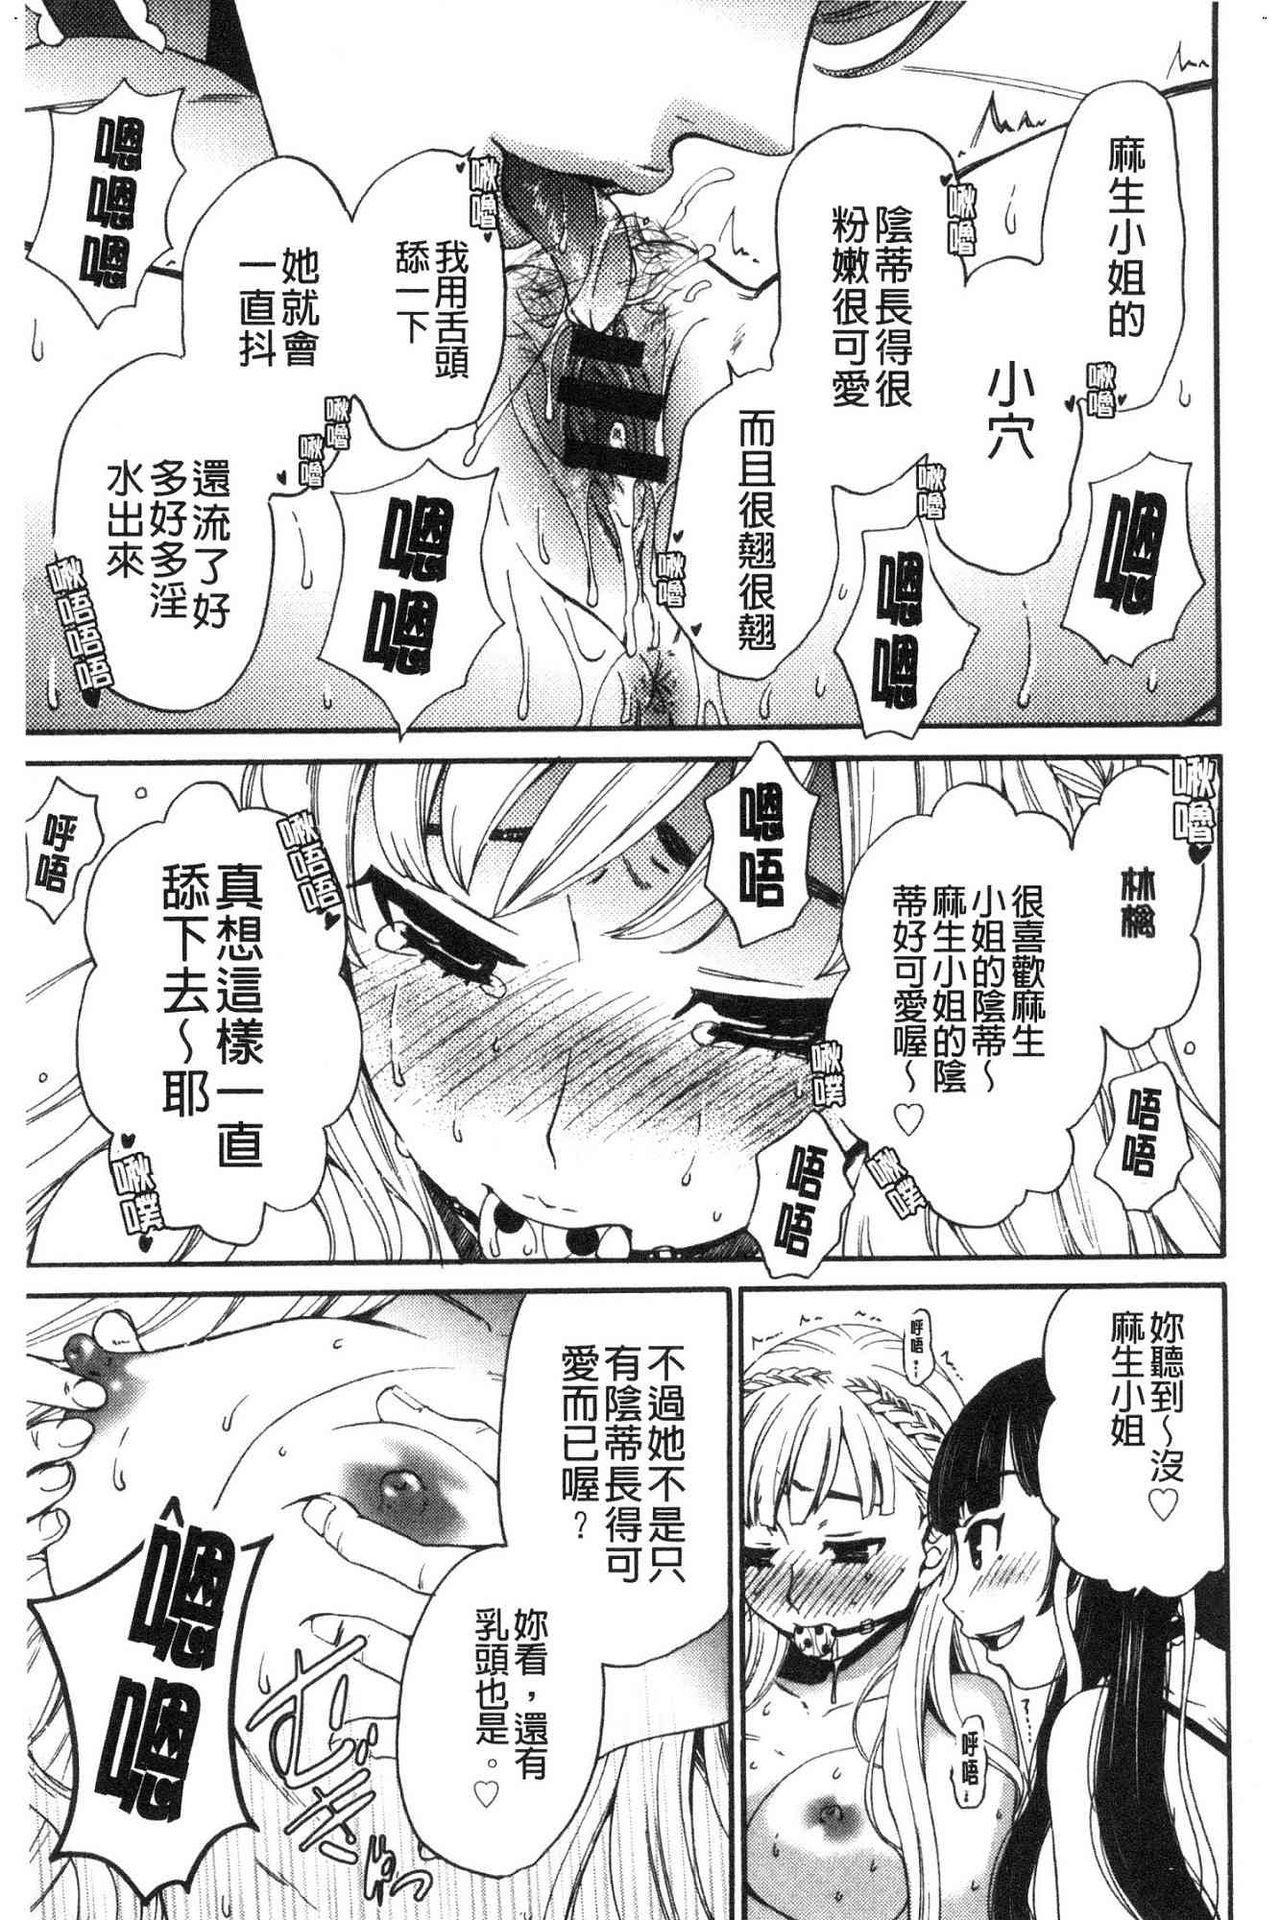 [Gotoh Akira]  21-ji no Onna ~Camera no Mae no Mesuinu~ 2 | 21時之女 ~鏡頭前的牝犬~ 2 [Chinese] 60